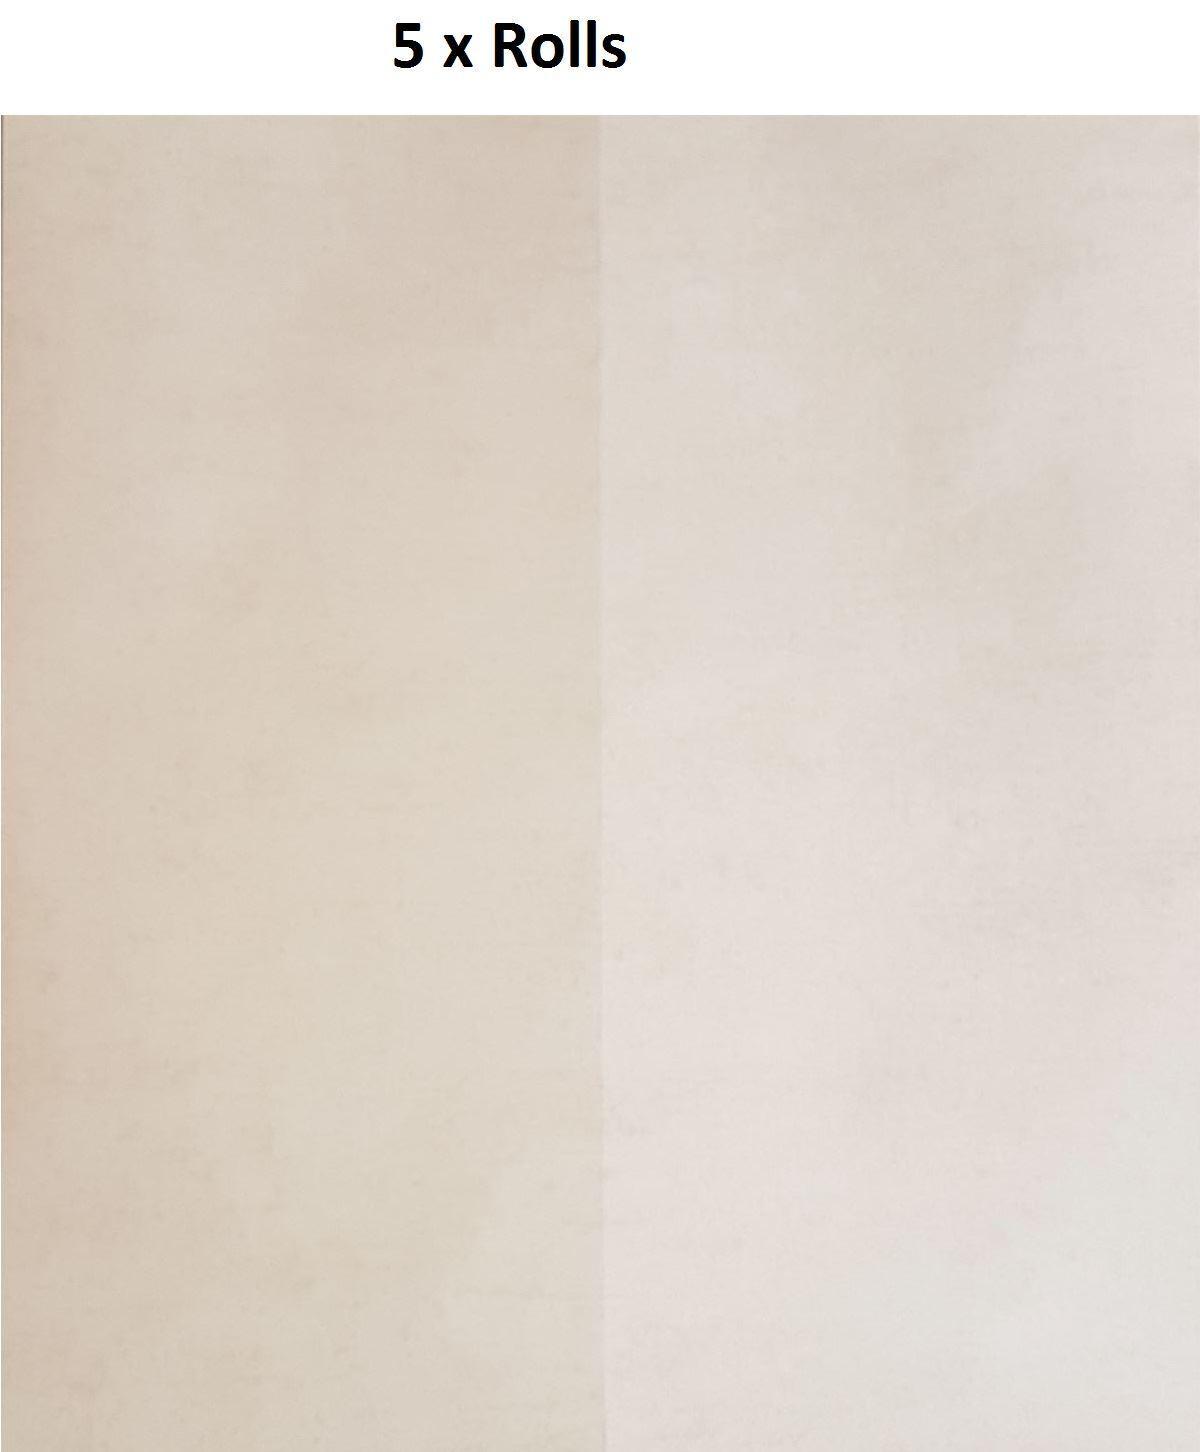 5 X Arden Beige Bold Stripe Wallpaper Two Tone Paste The Wall Holden Decor